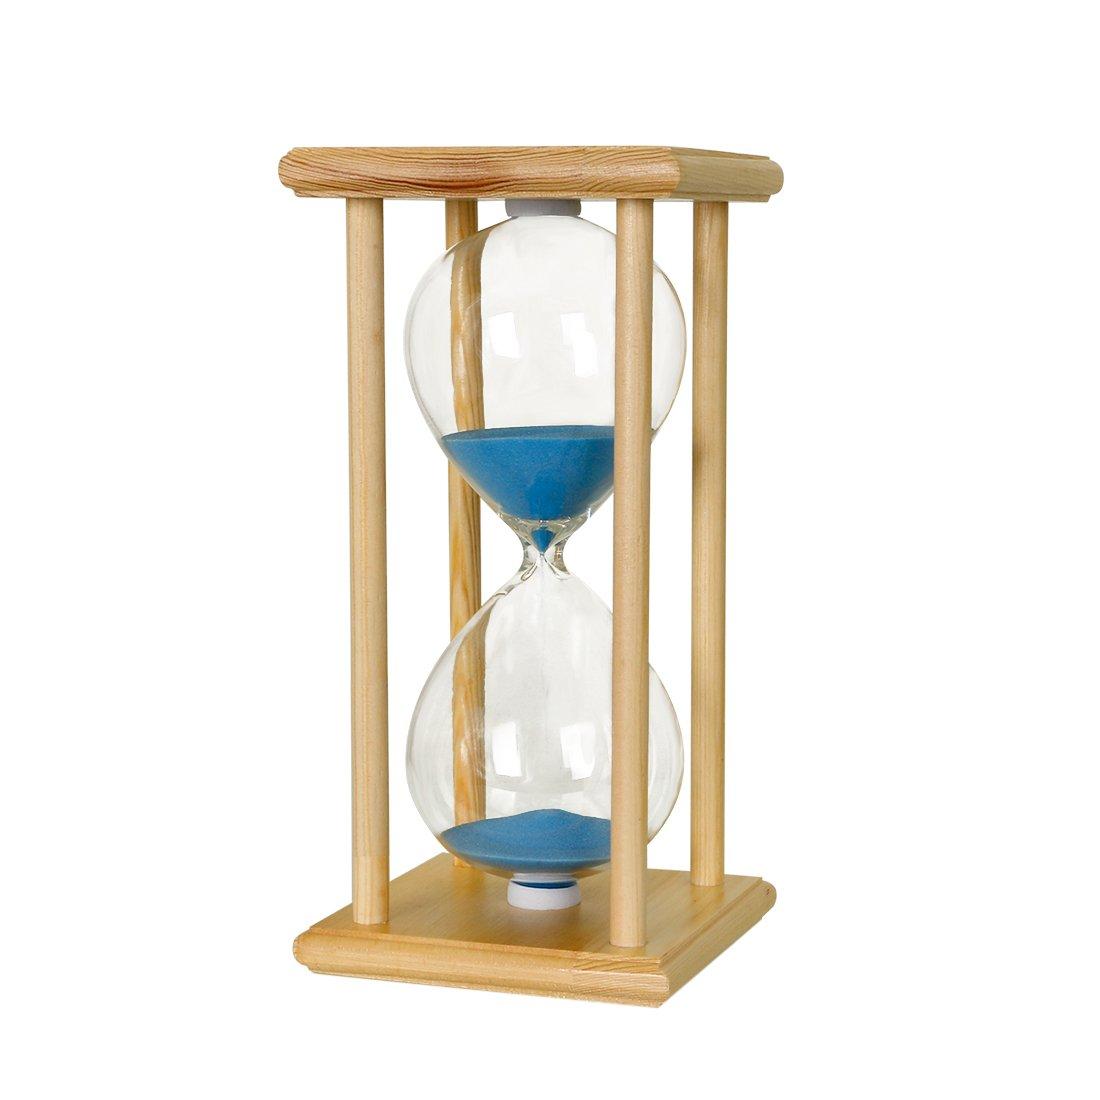 BOJIN Sea Blue Decor Hourglass Sand Timer - 60 Minutes Classical Wood Frame BOJ002170